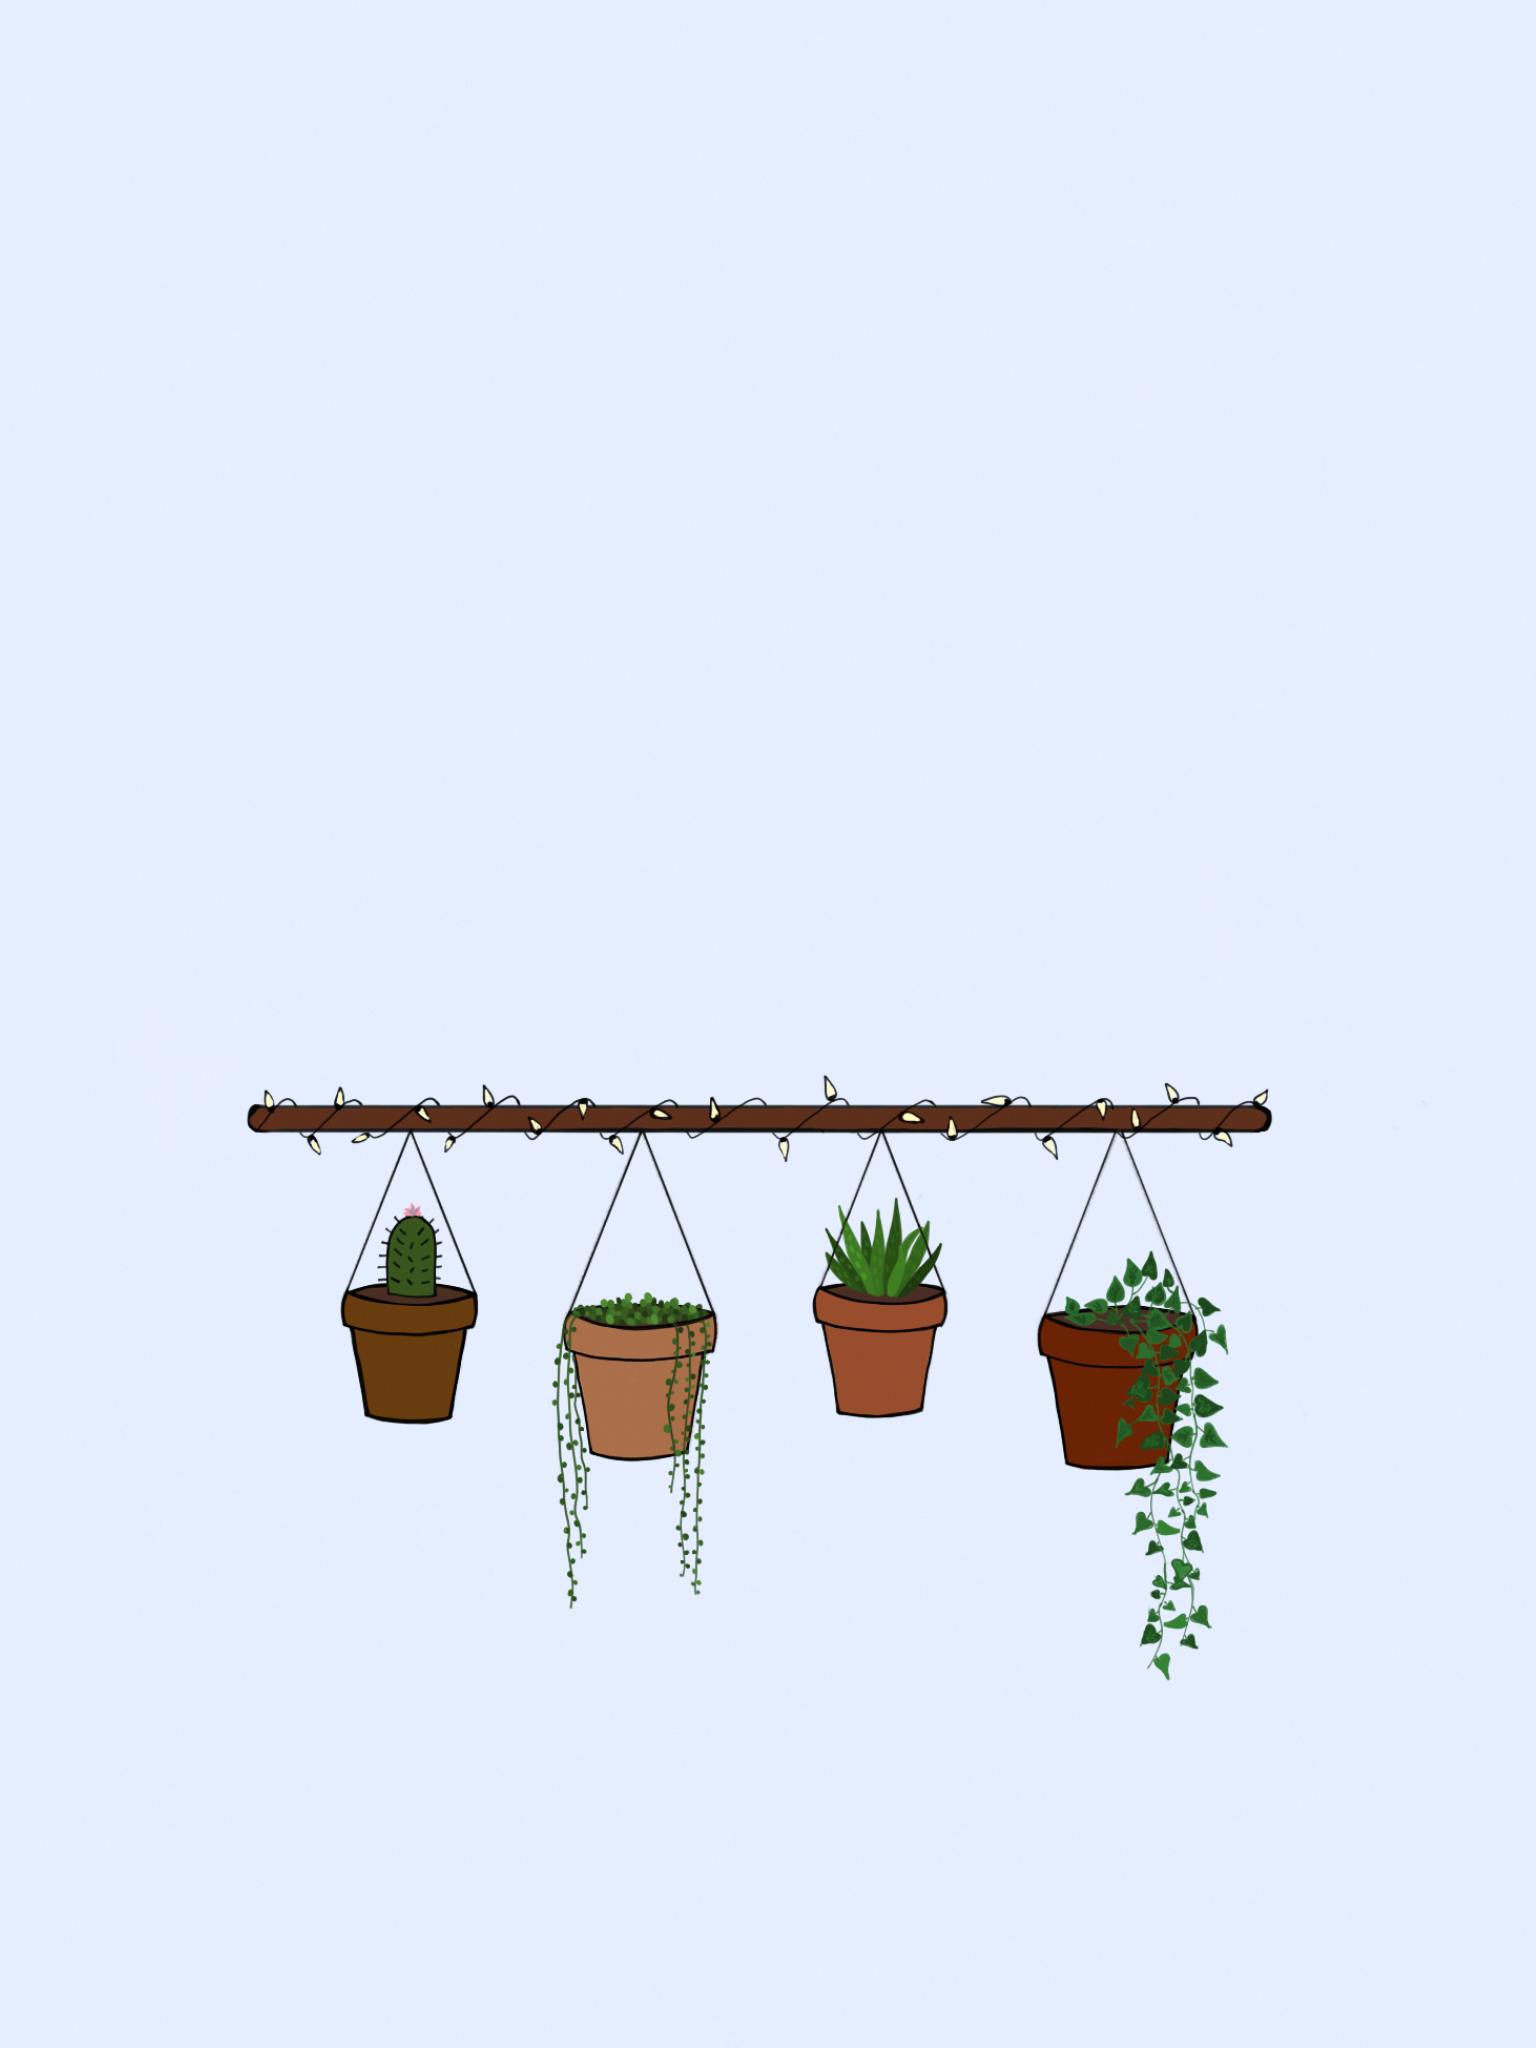 Hanging Plants Fairy Lights Hangingoutdoorplants Plant Doodle Plant Wallpaper Hanging Plants